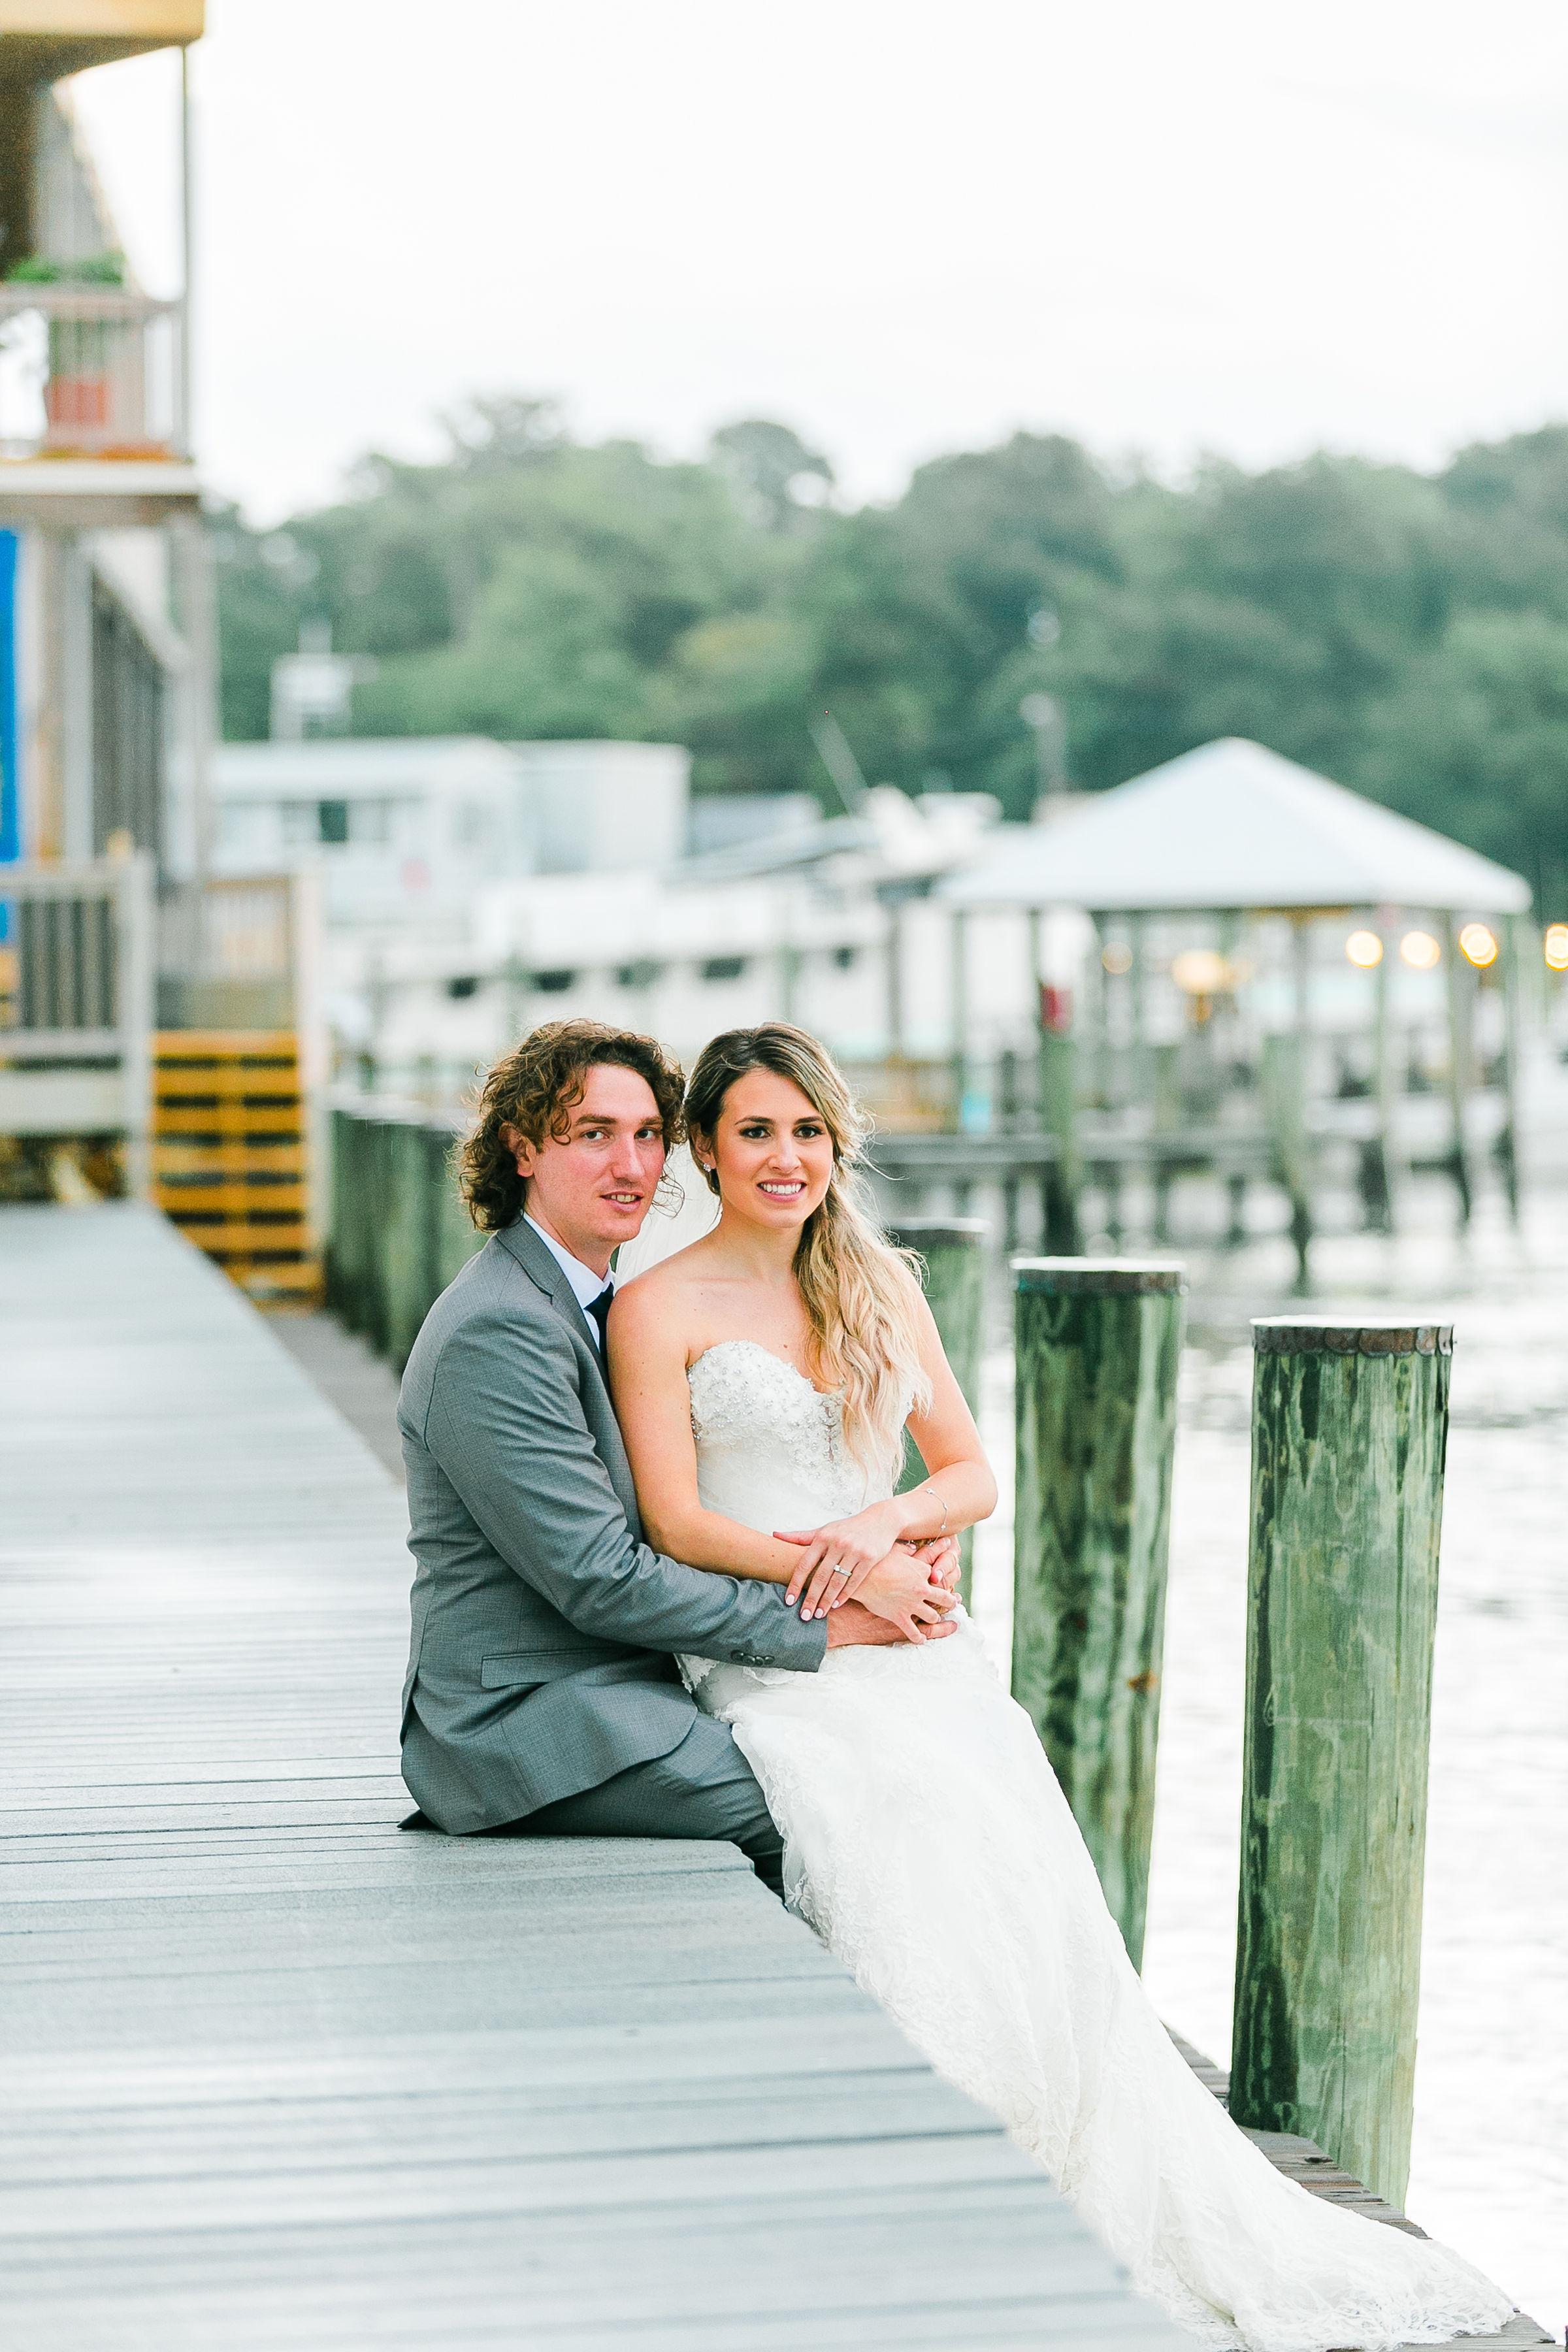 Nicole&Bryce_Bride&GroomPortraits-38.jpg